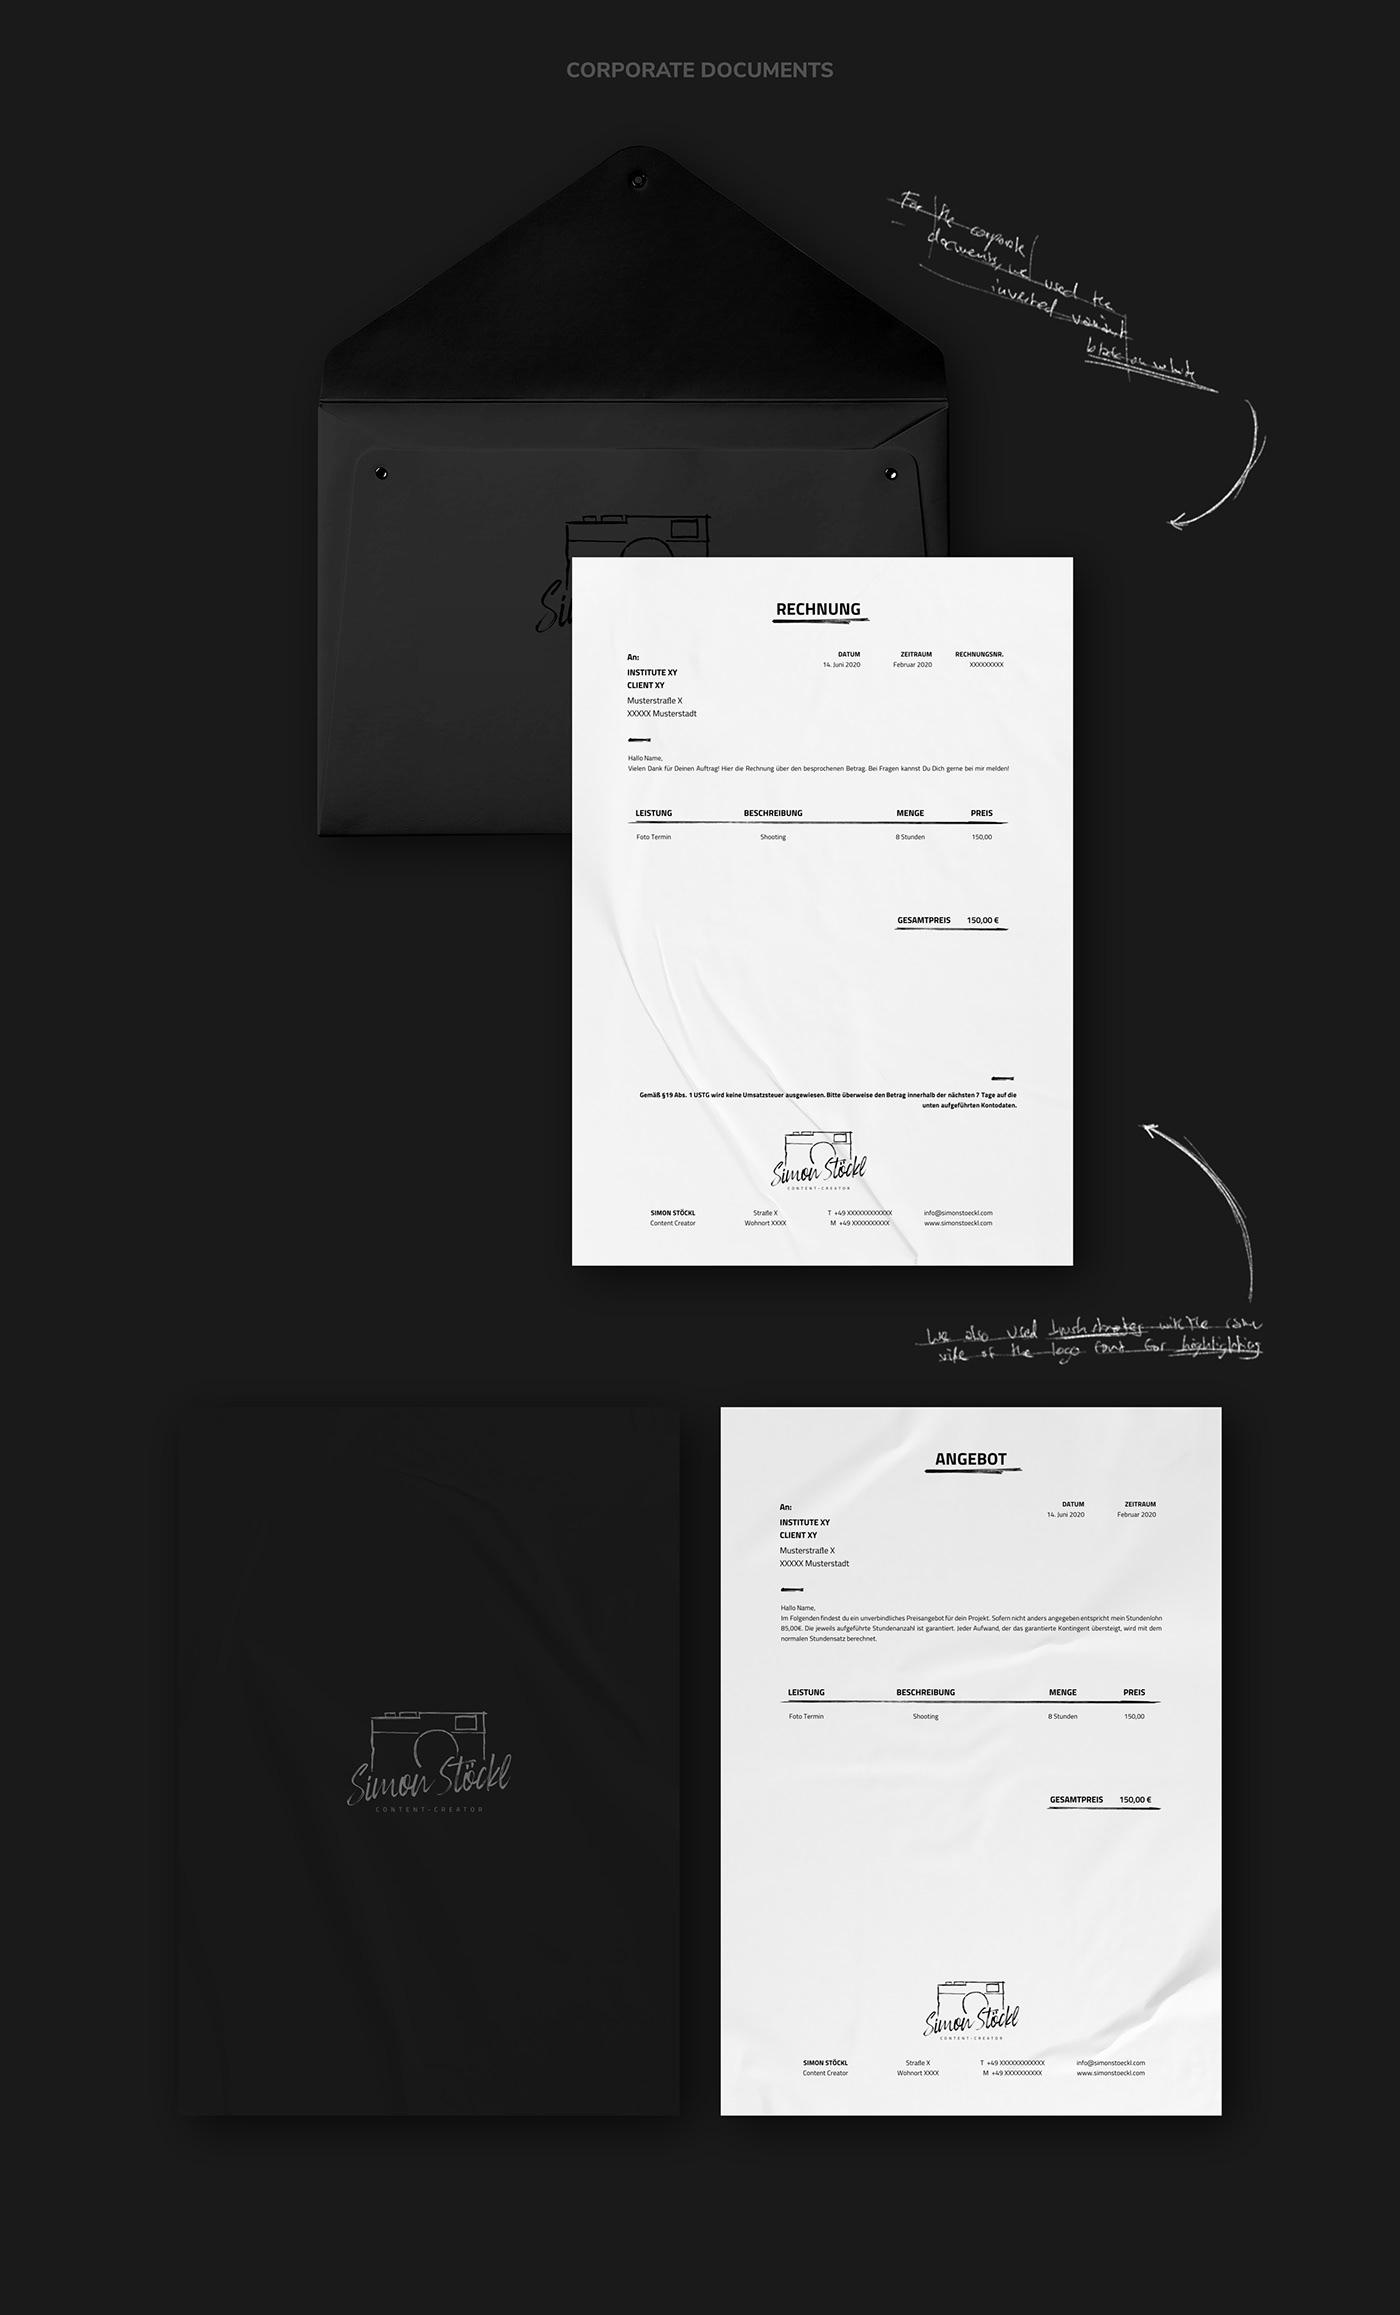 SIMON STÖCKL // Documents